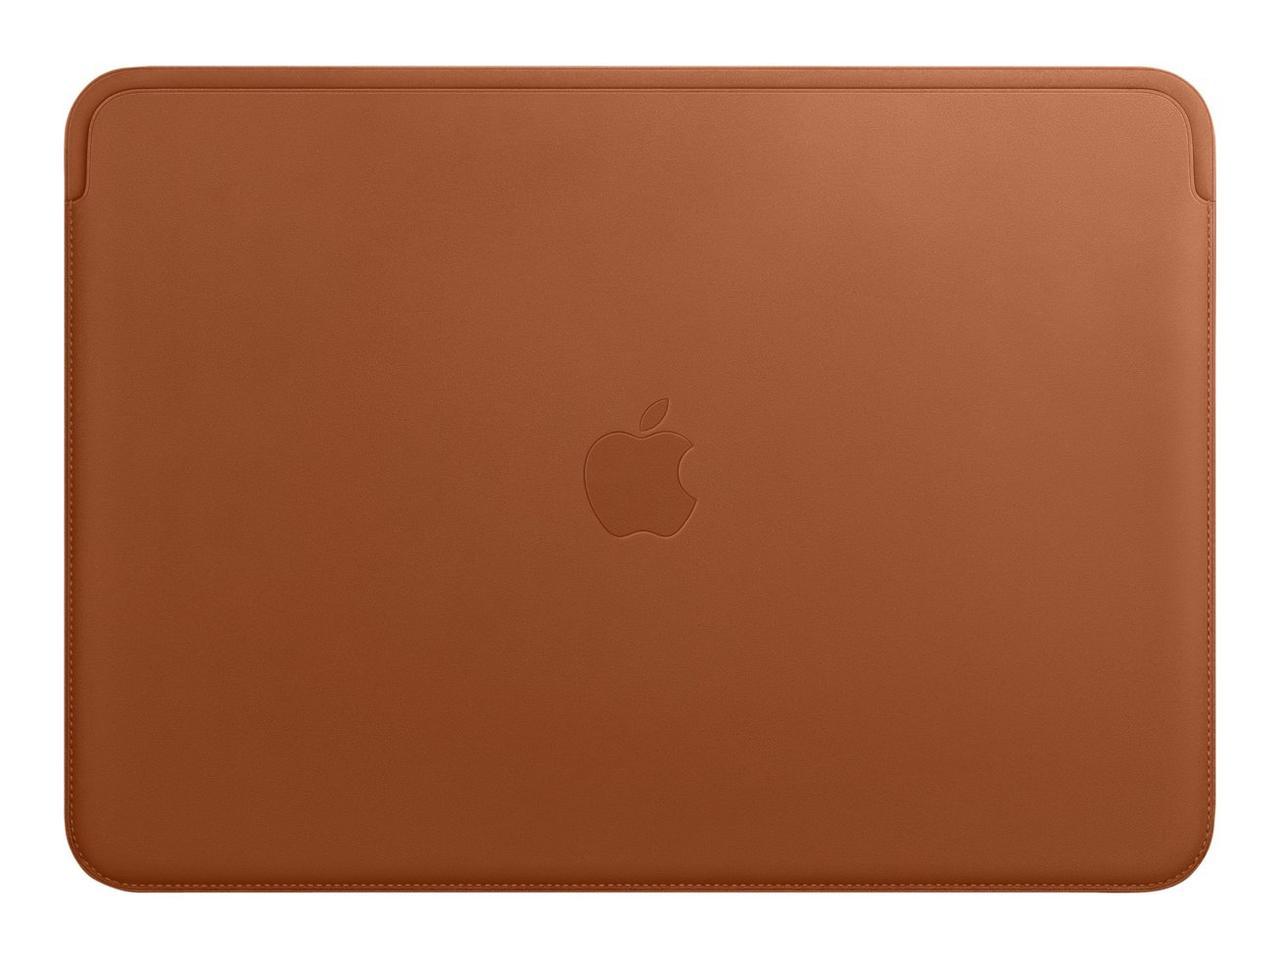 "Чехол для MacBook 15"" Apple Leather Sleeve, коричневый (MRQV2ZM/A)"